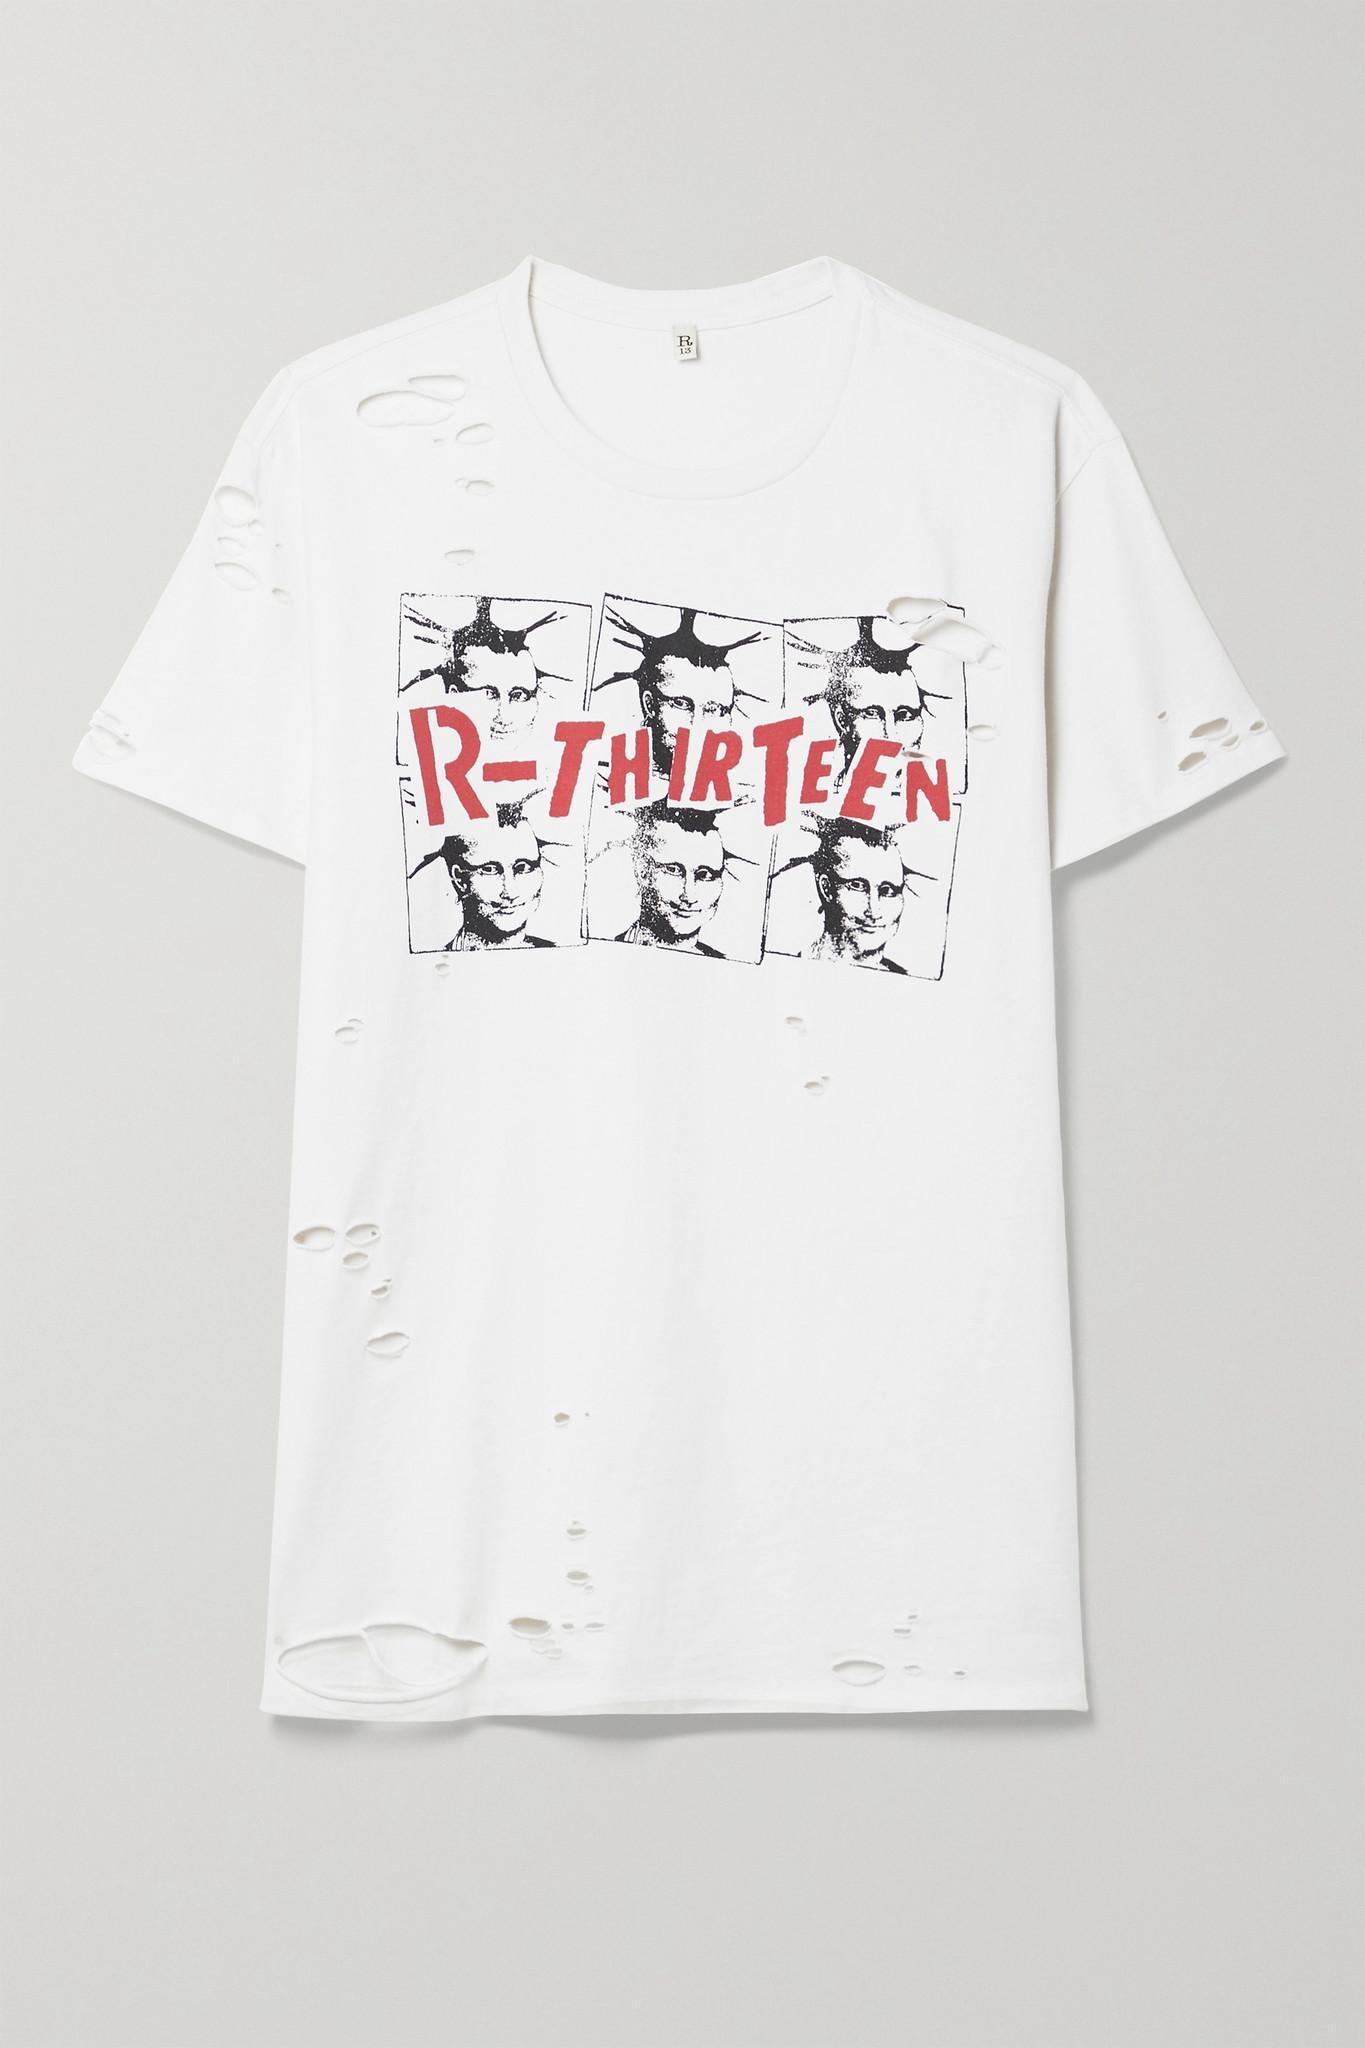 R13 - Mona Lisa Boy Distressed Printed Cotton-jersey T-shirt - White - x small